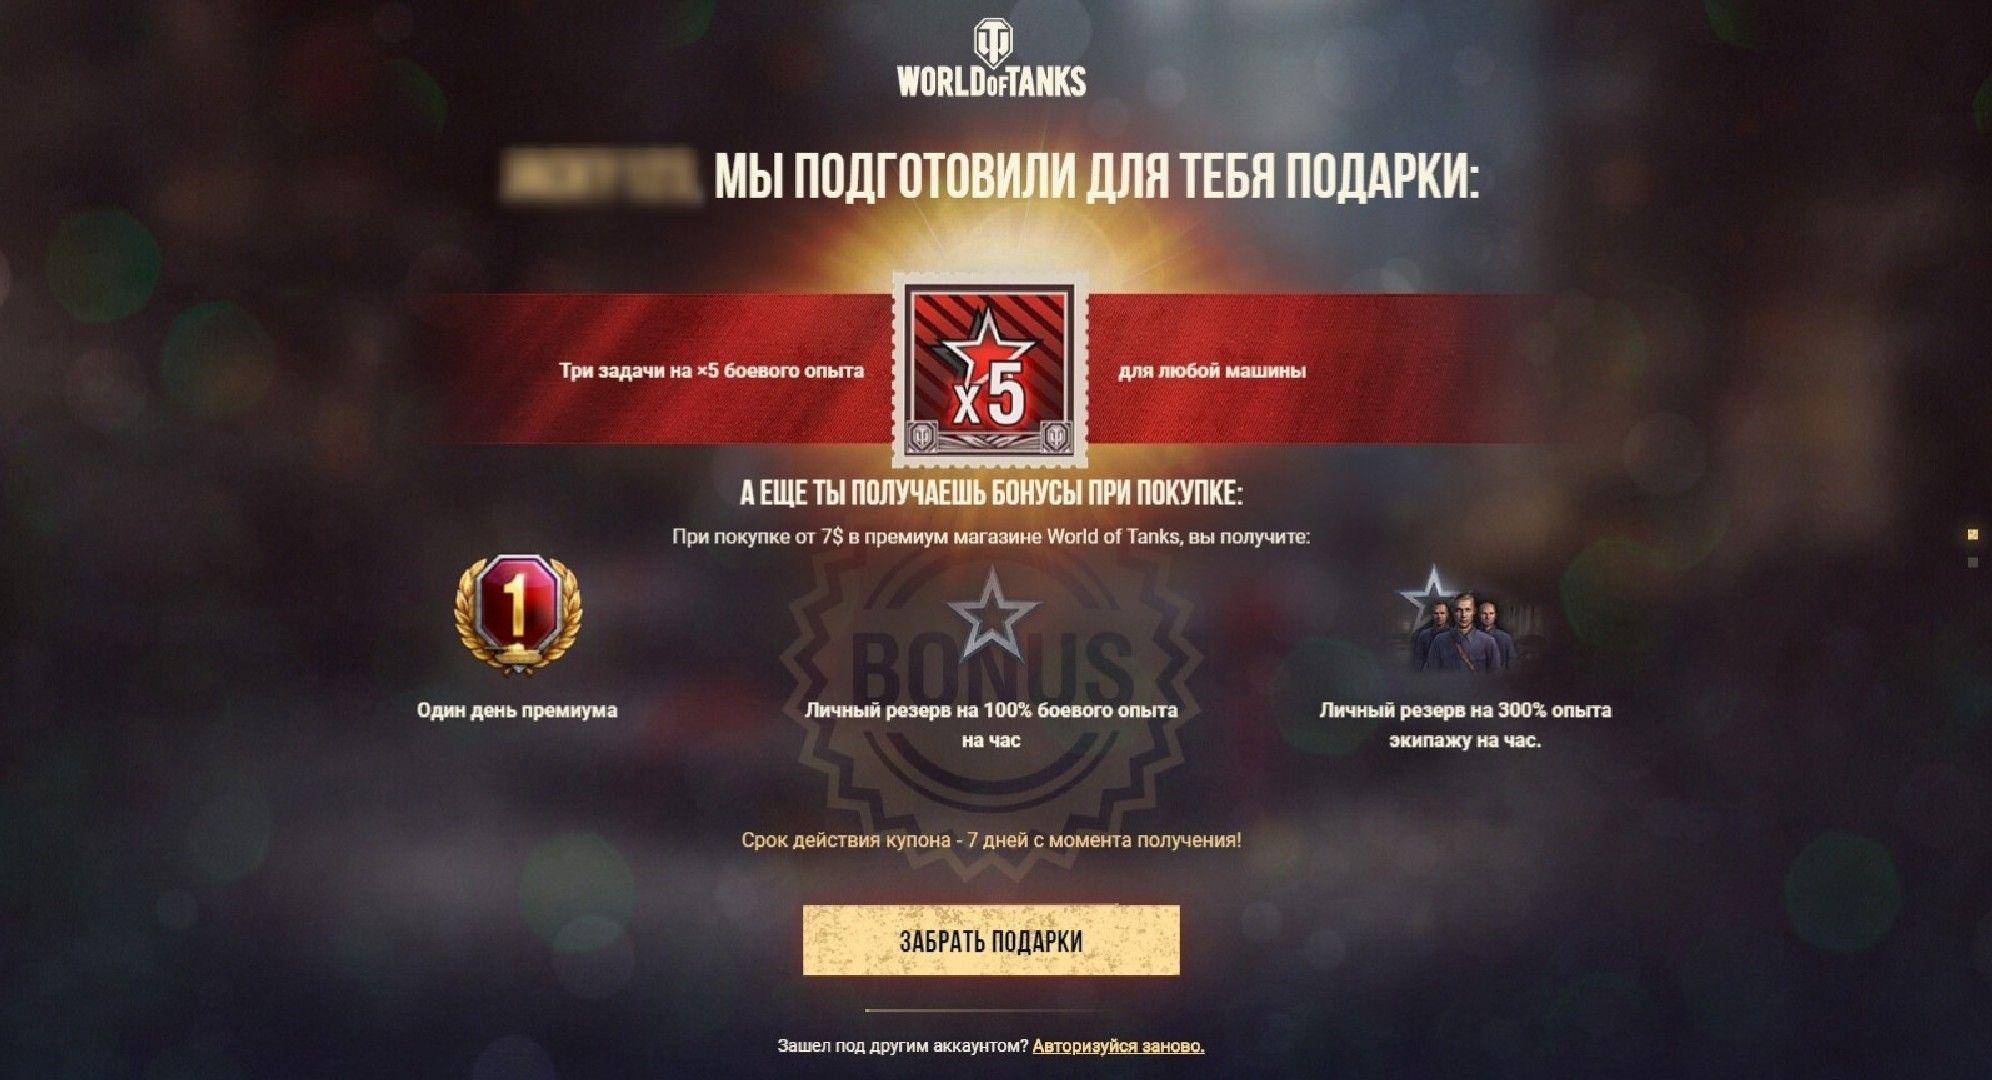 Prizebox - ежемесячная награда в World of Tanks.